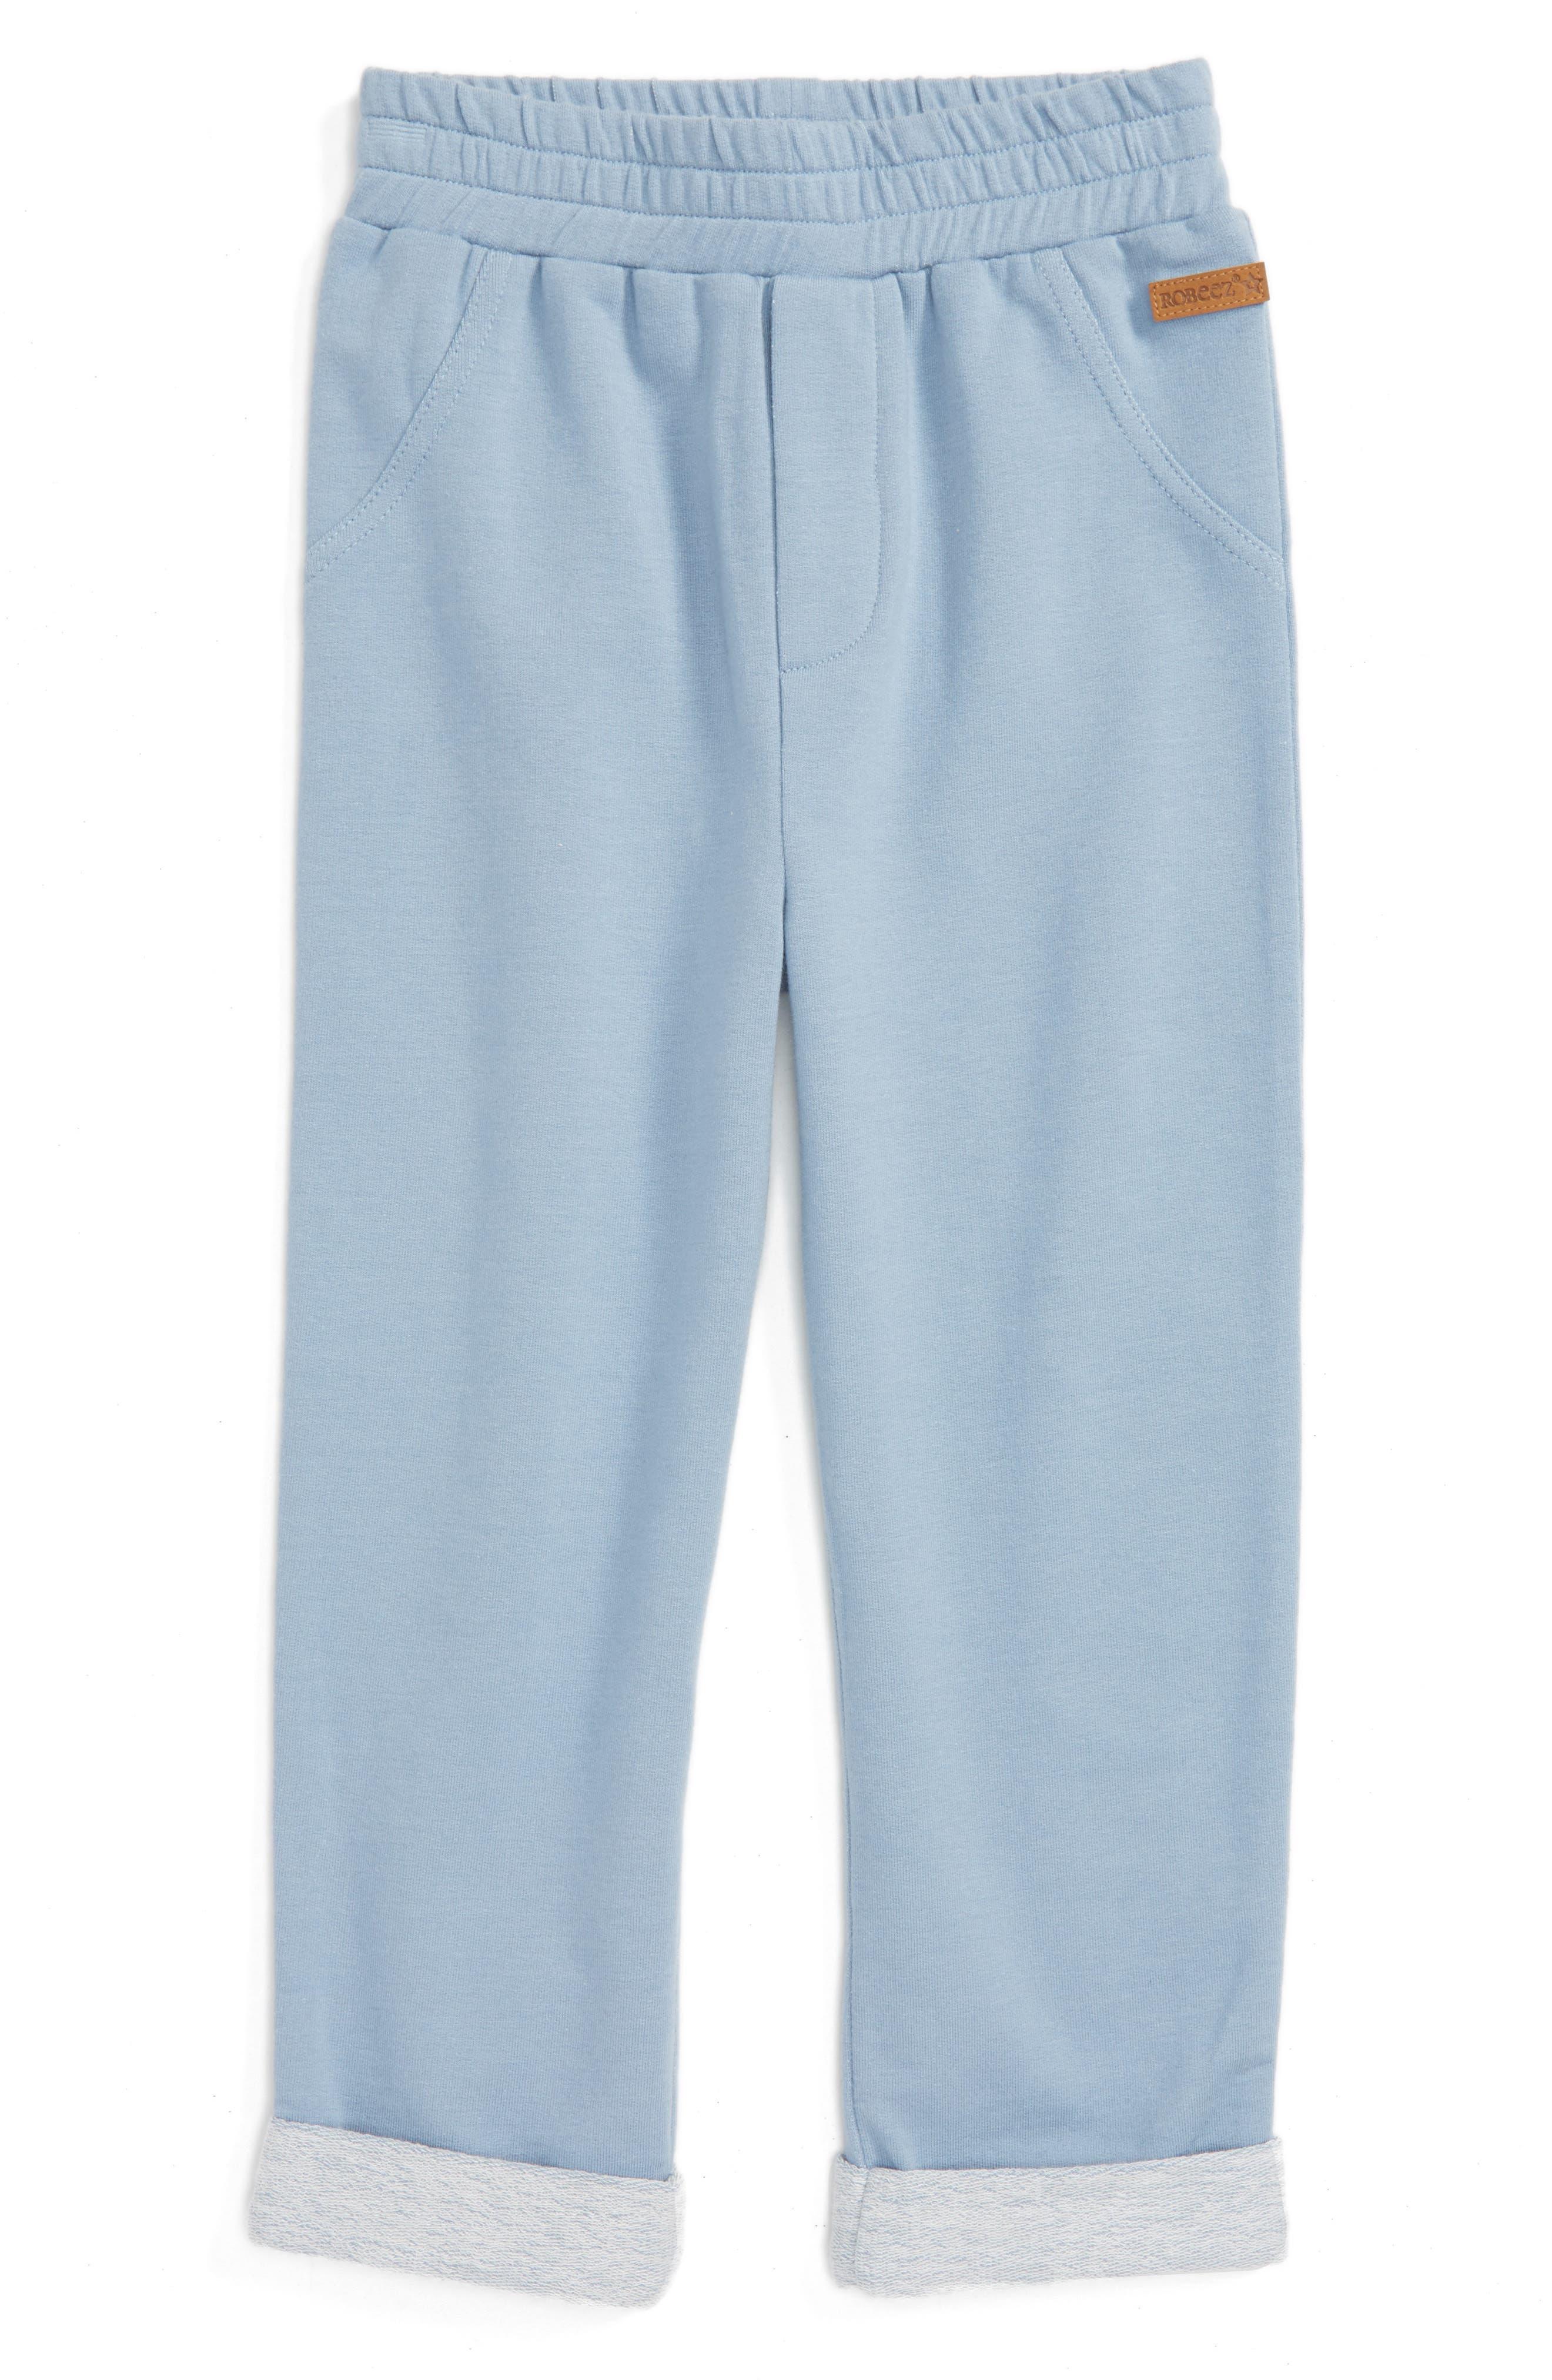 ROBEEZ<SUP>®</SUP> Knit Pants